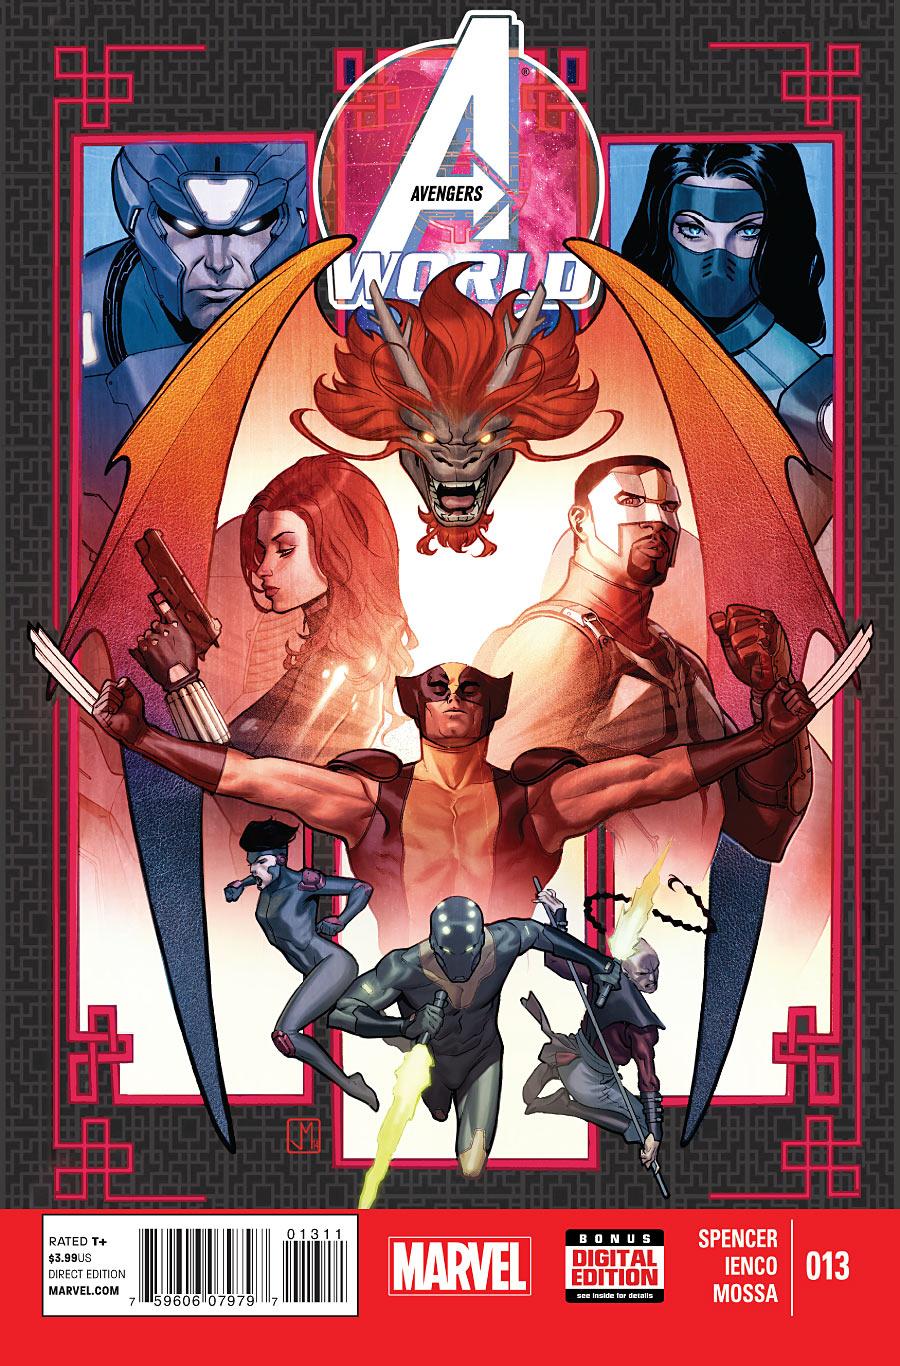 Avengers World Vol 1 13 | Marvel Database | FANDOM powered by Wikia